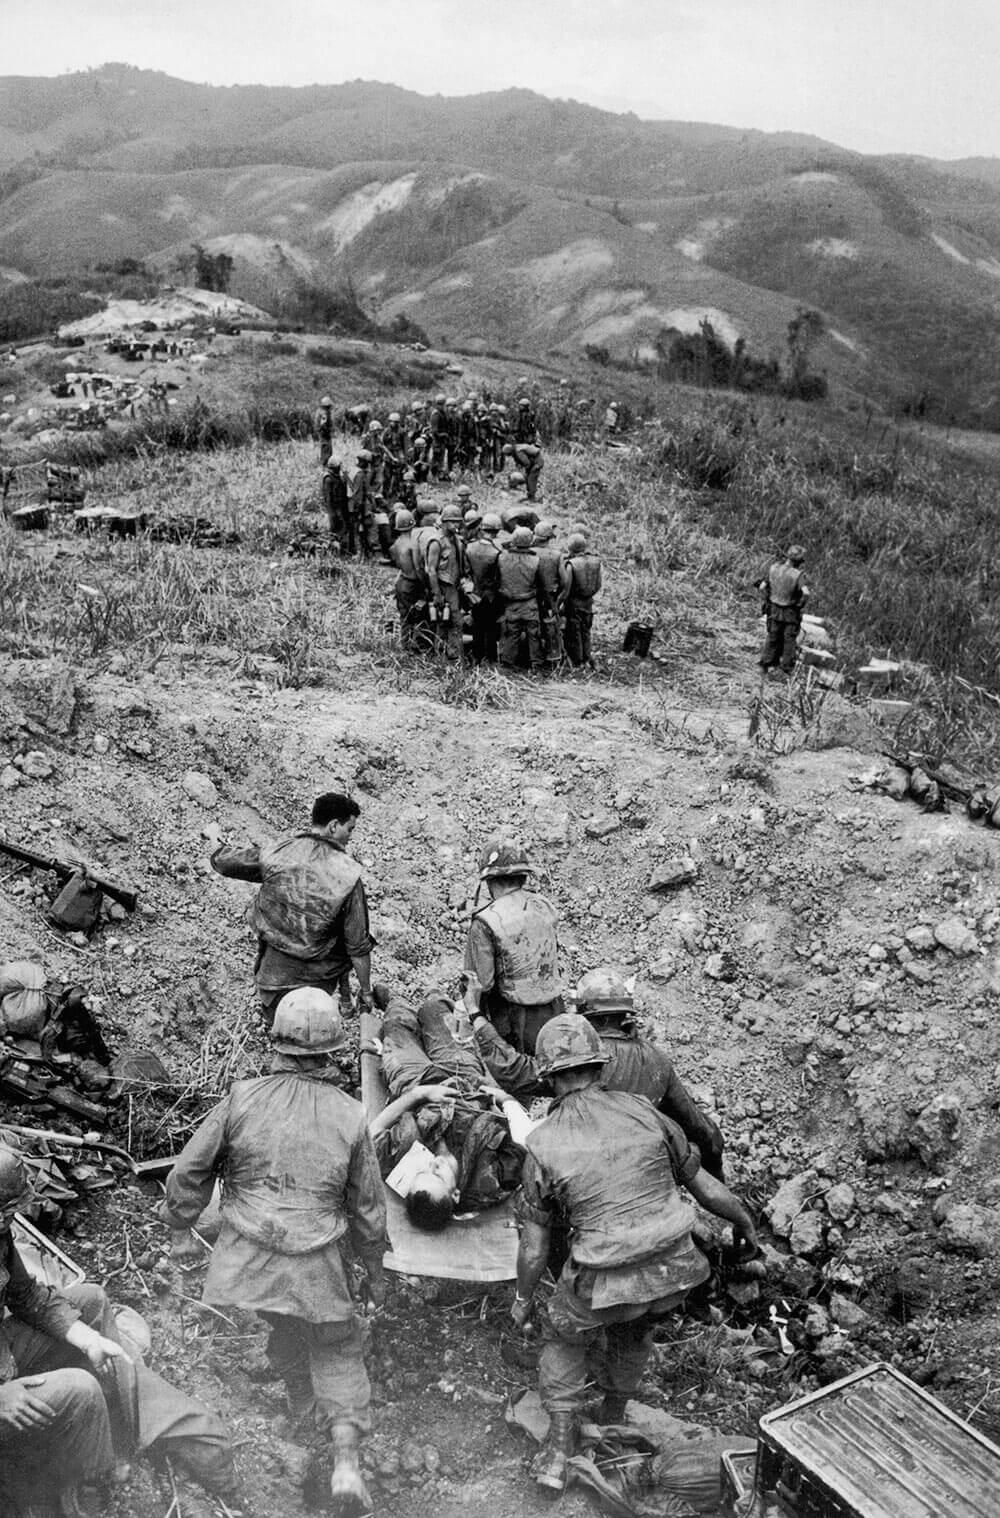 Vietnam Casualty fine art photography